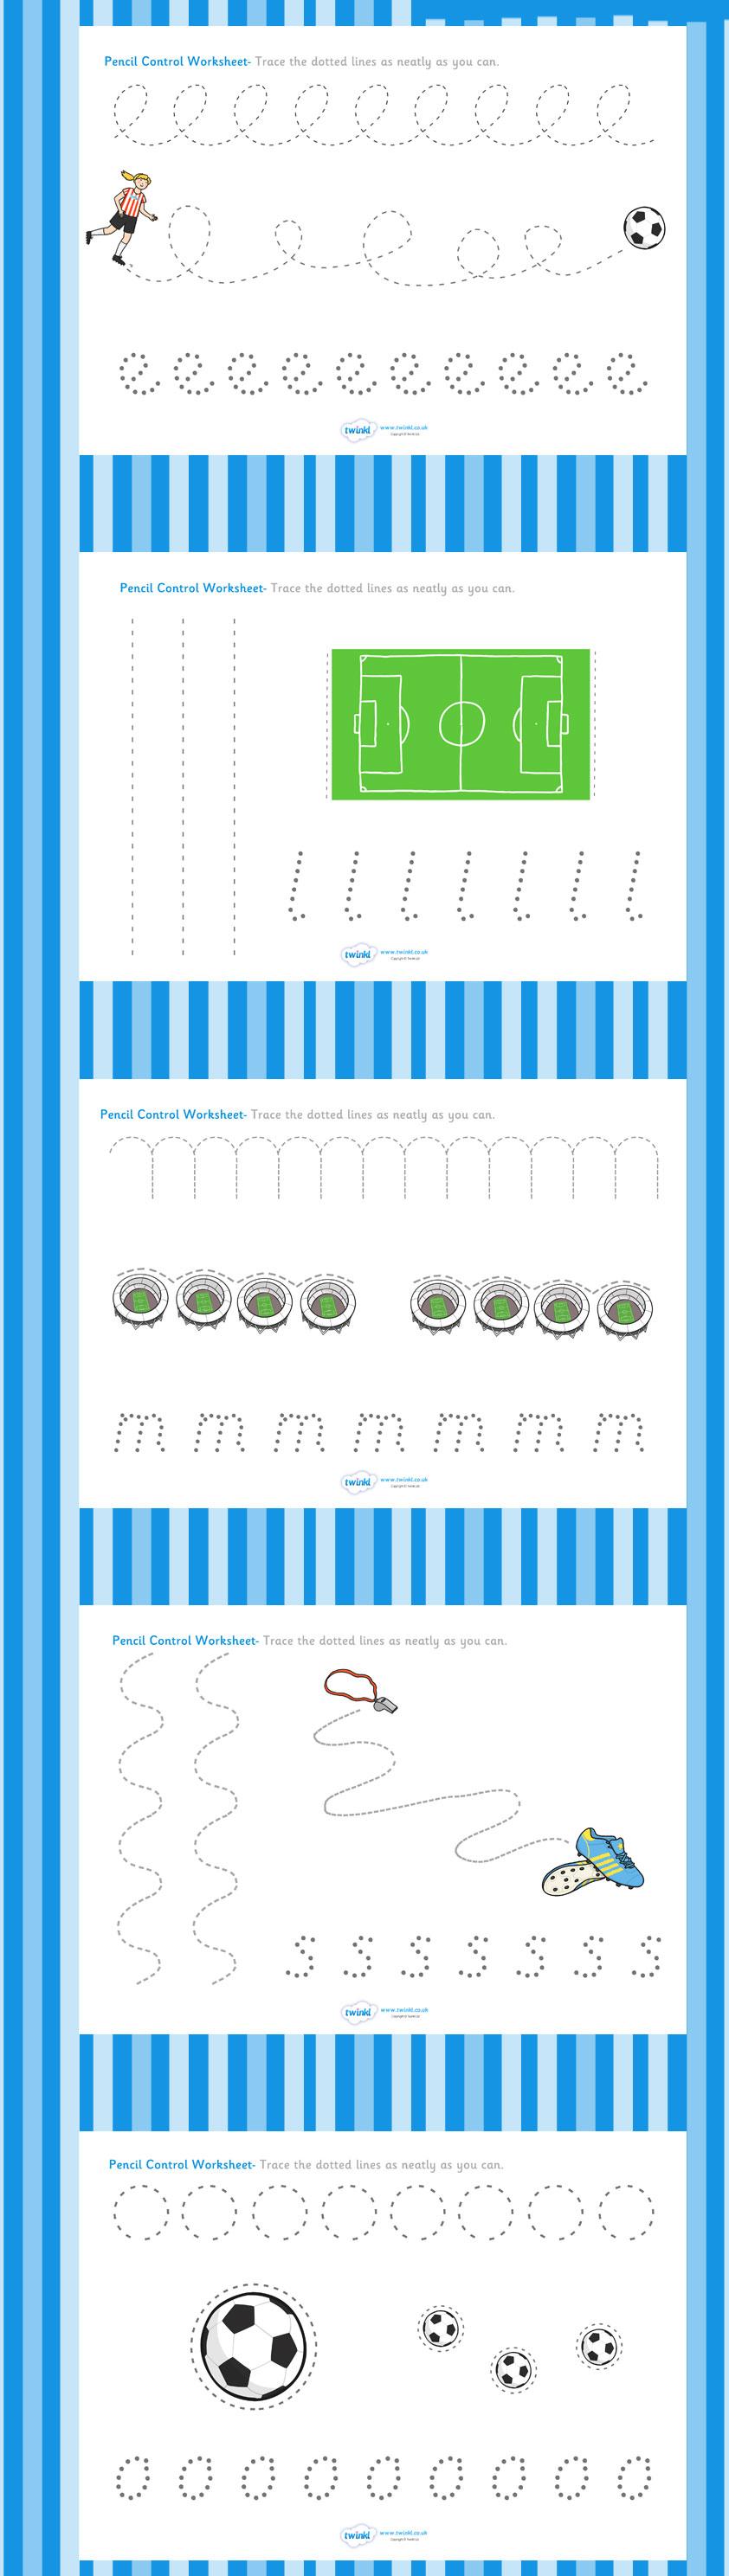 football world cup pencil control worksheets 1 bekkur schreib bungen bung vorschule bungen. Black Bedroom Furniture Sets. Home Design Ideas